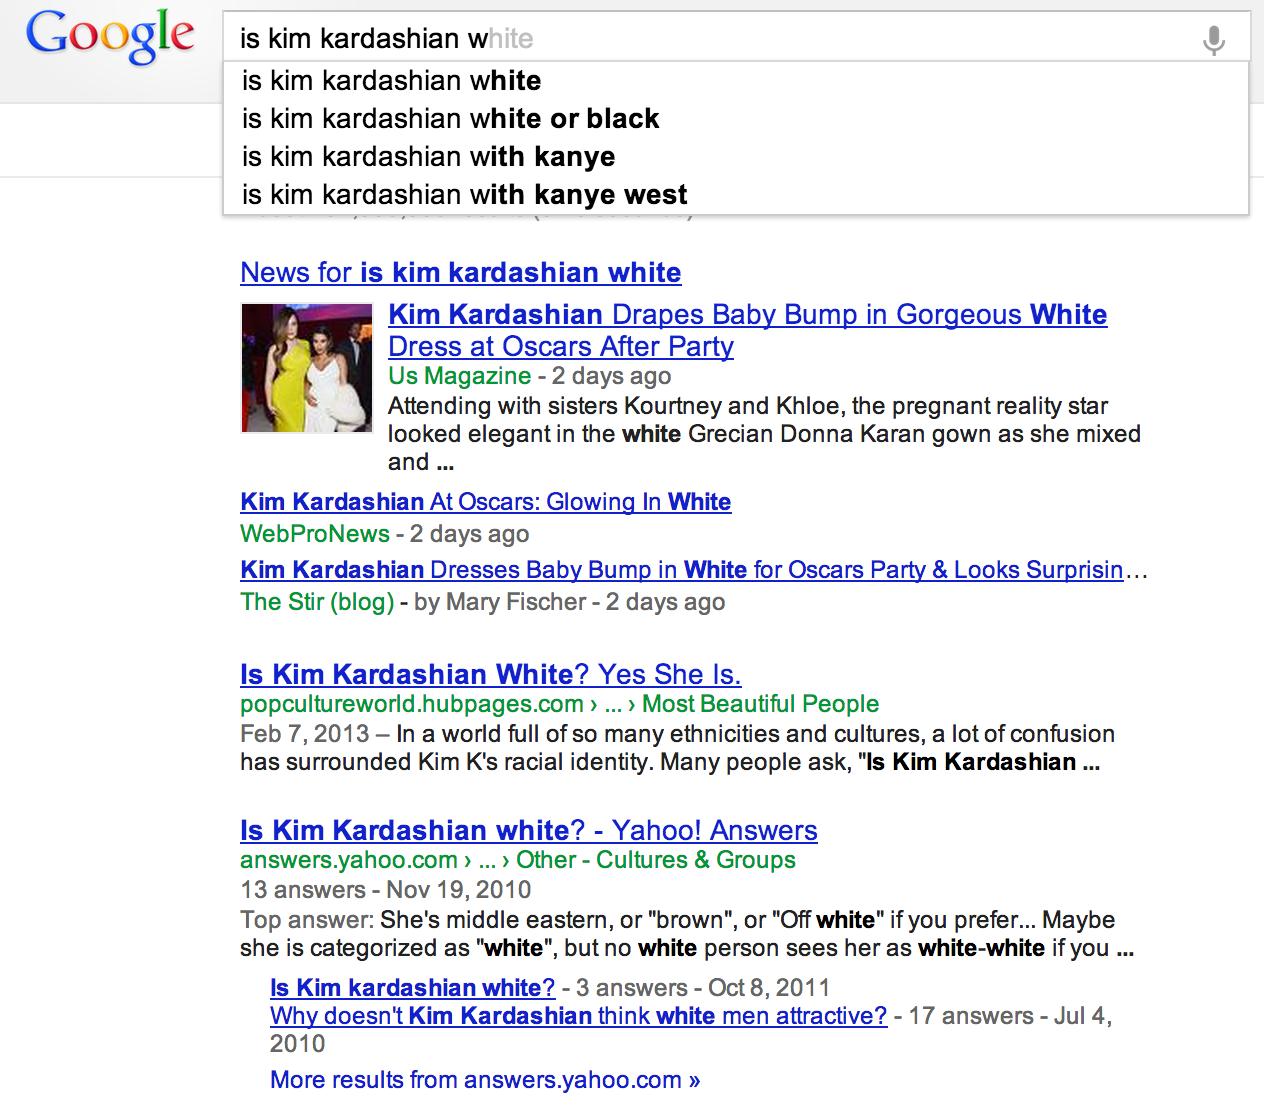 is_kim_k_white?